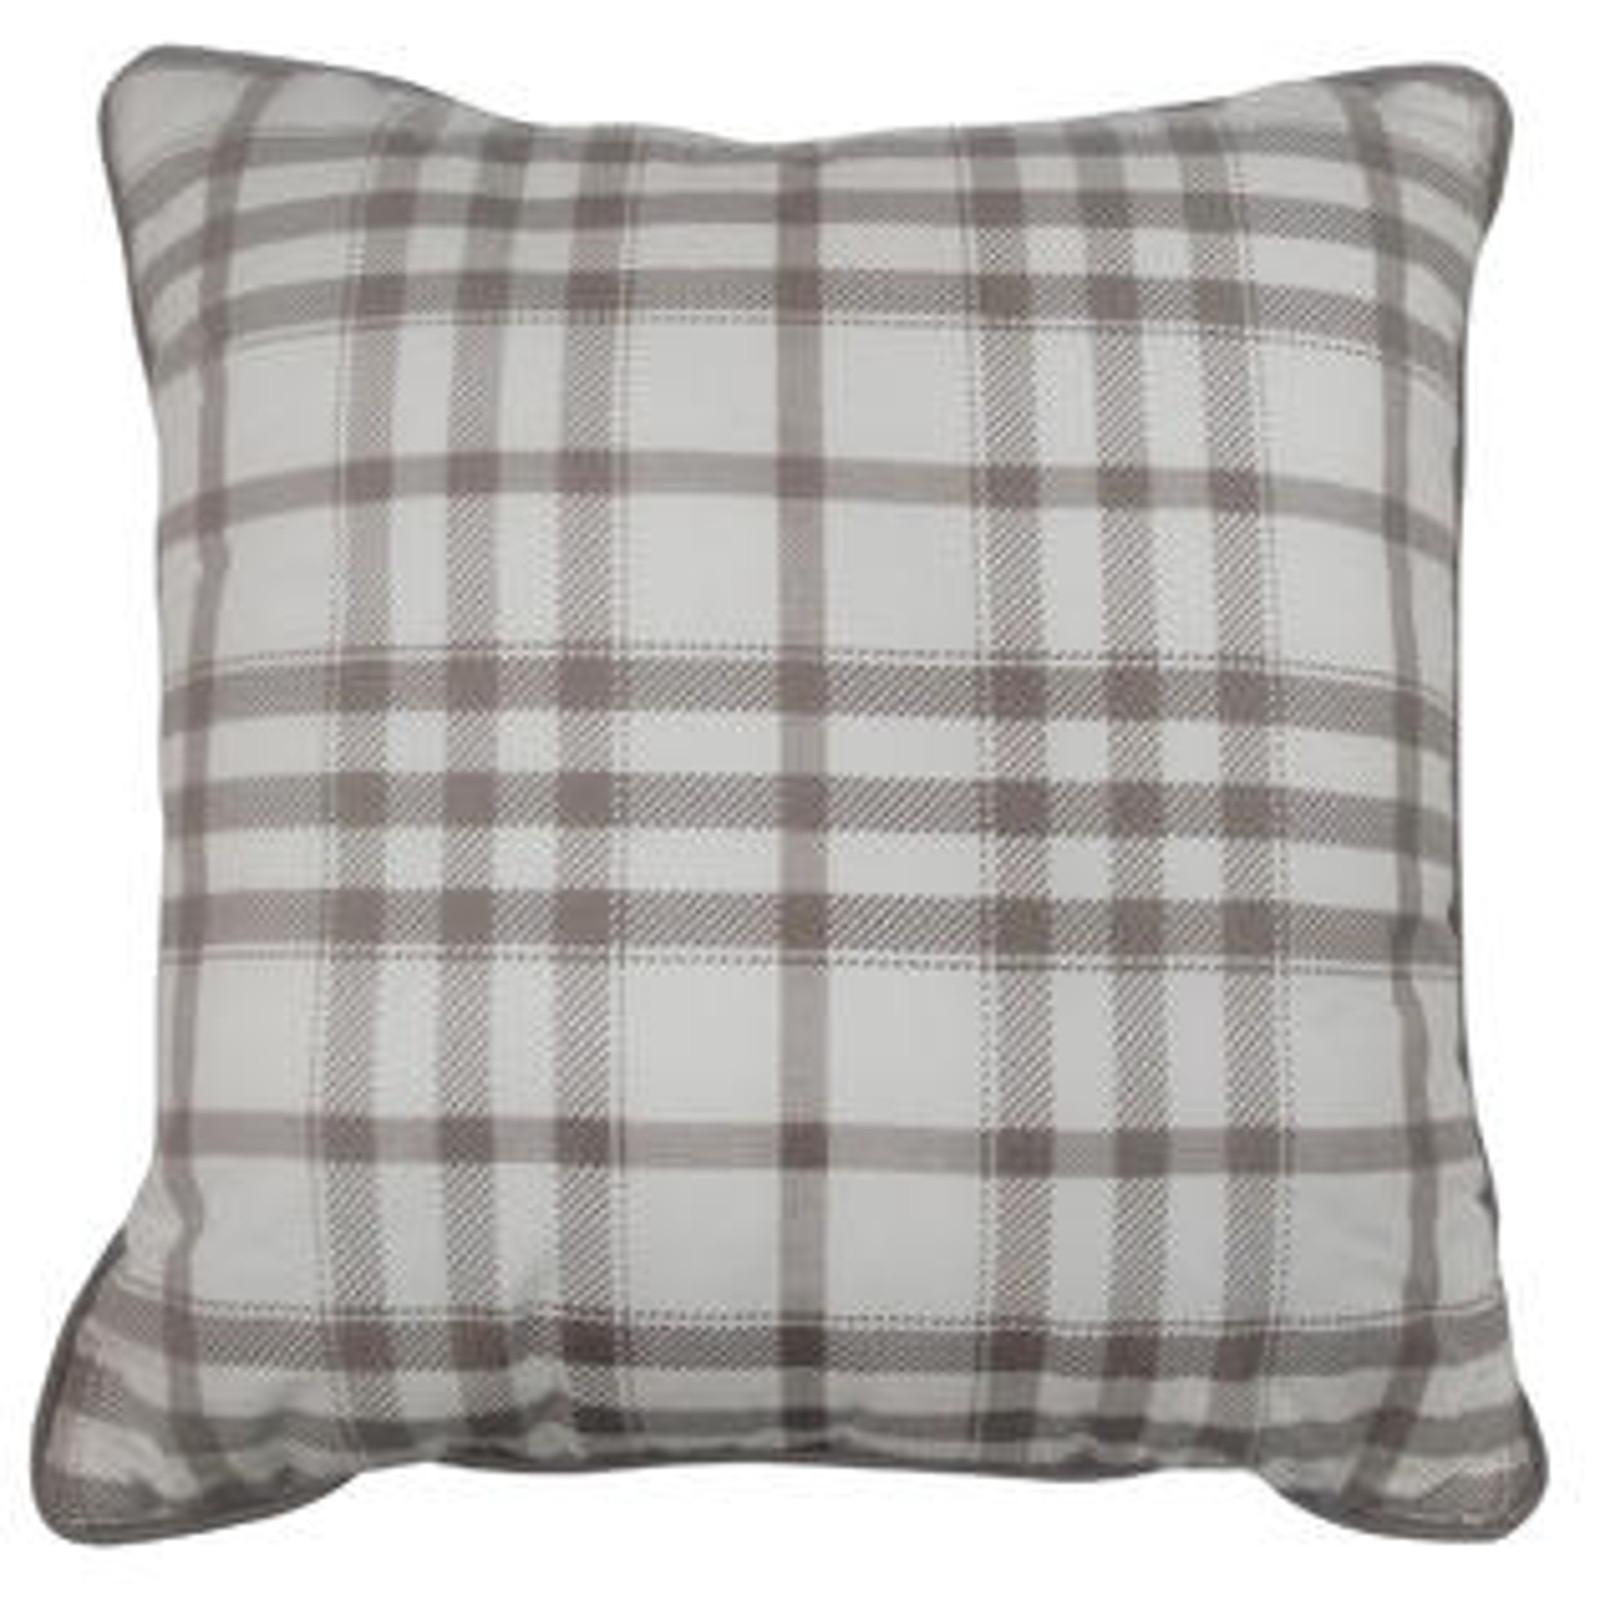 "18"" x 18"" Decorative Pillow - Plaid im test"